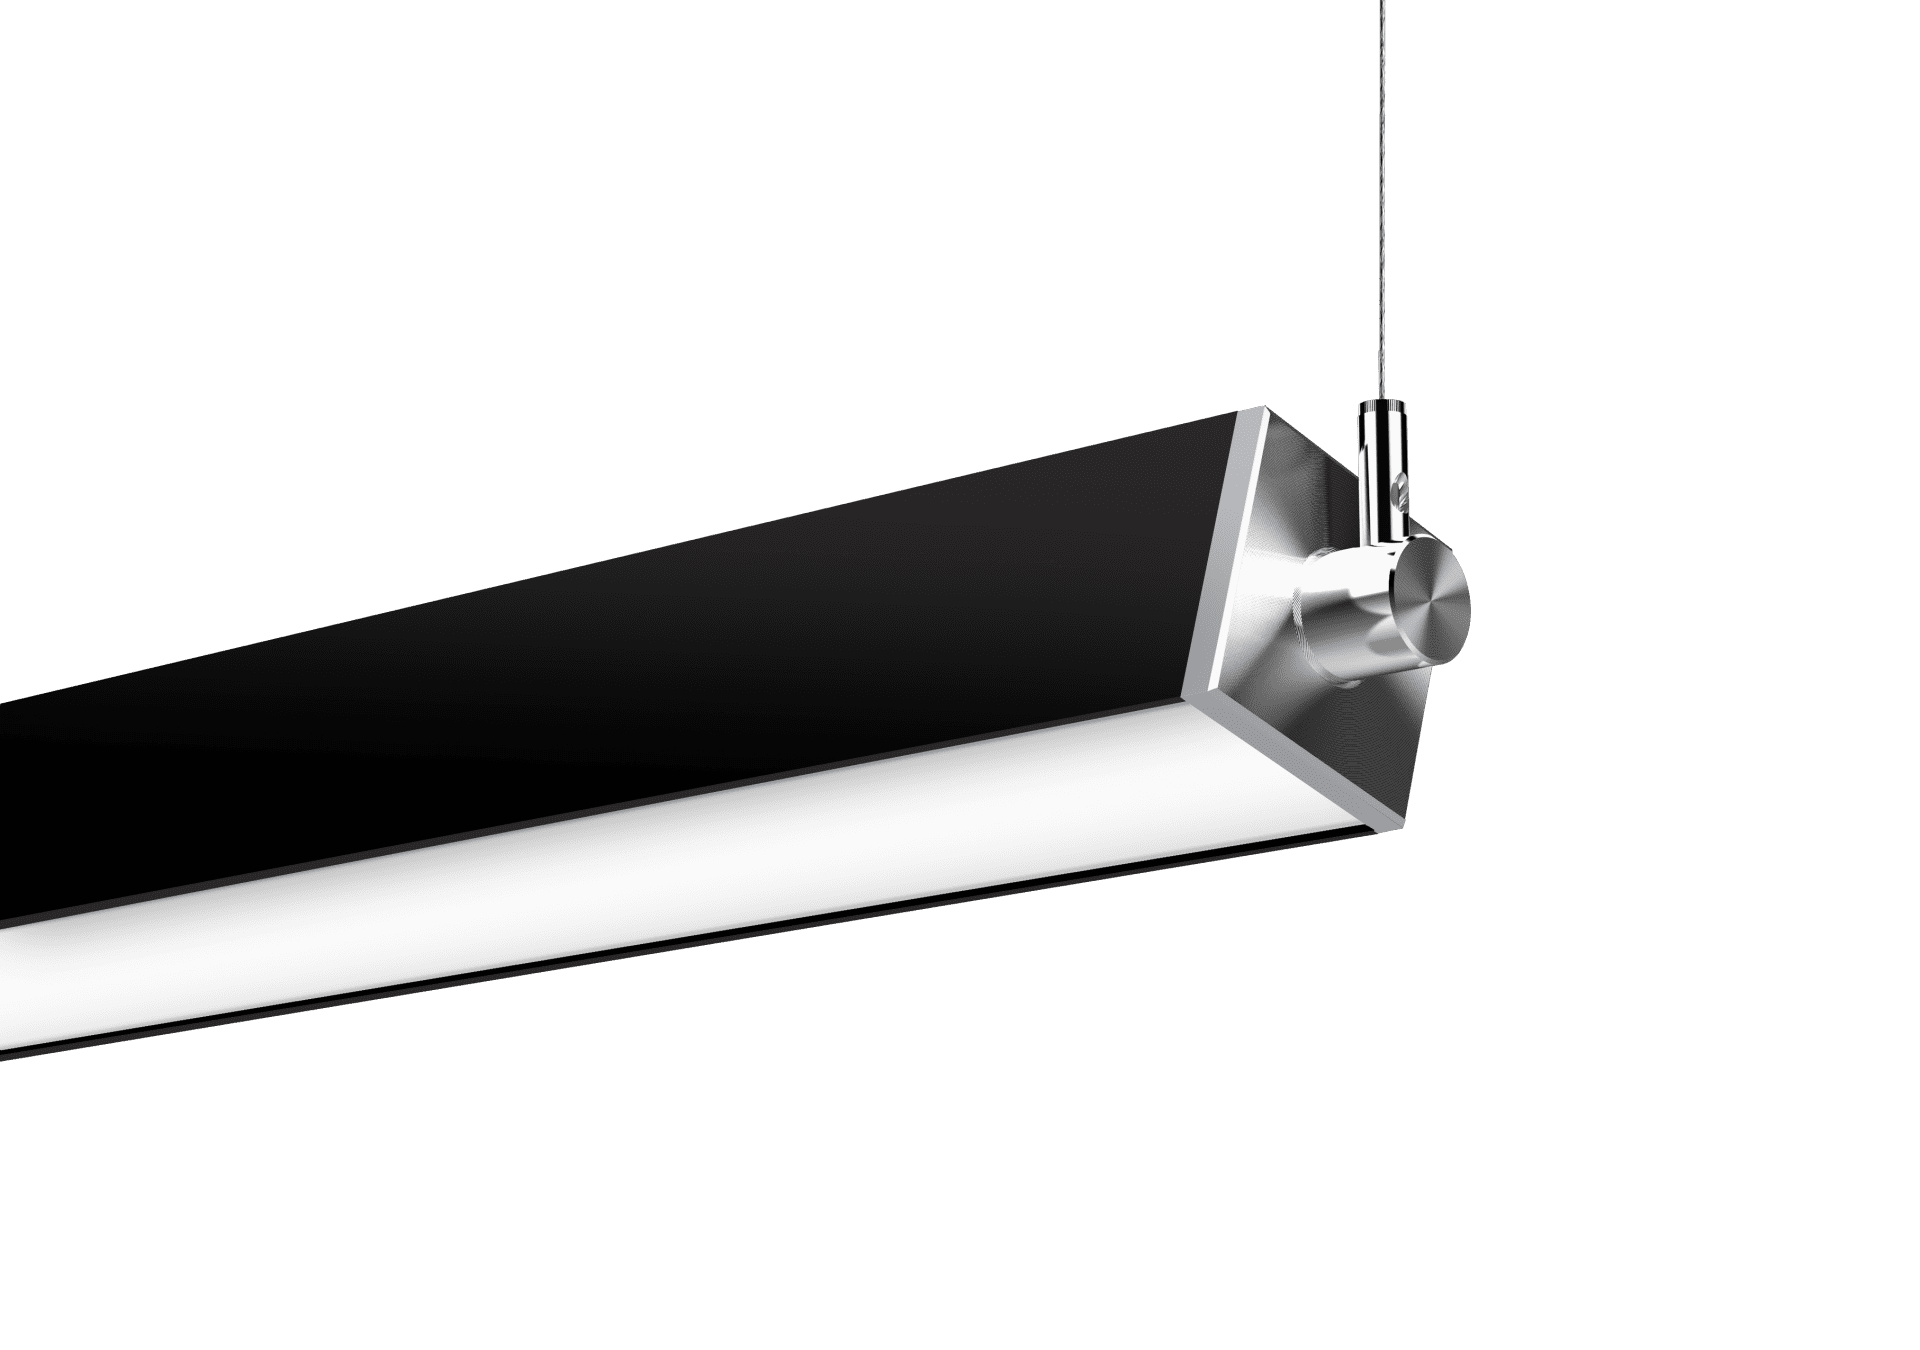 Nitrogen 3 Black Cable Suspended Rotational